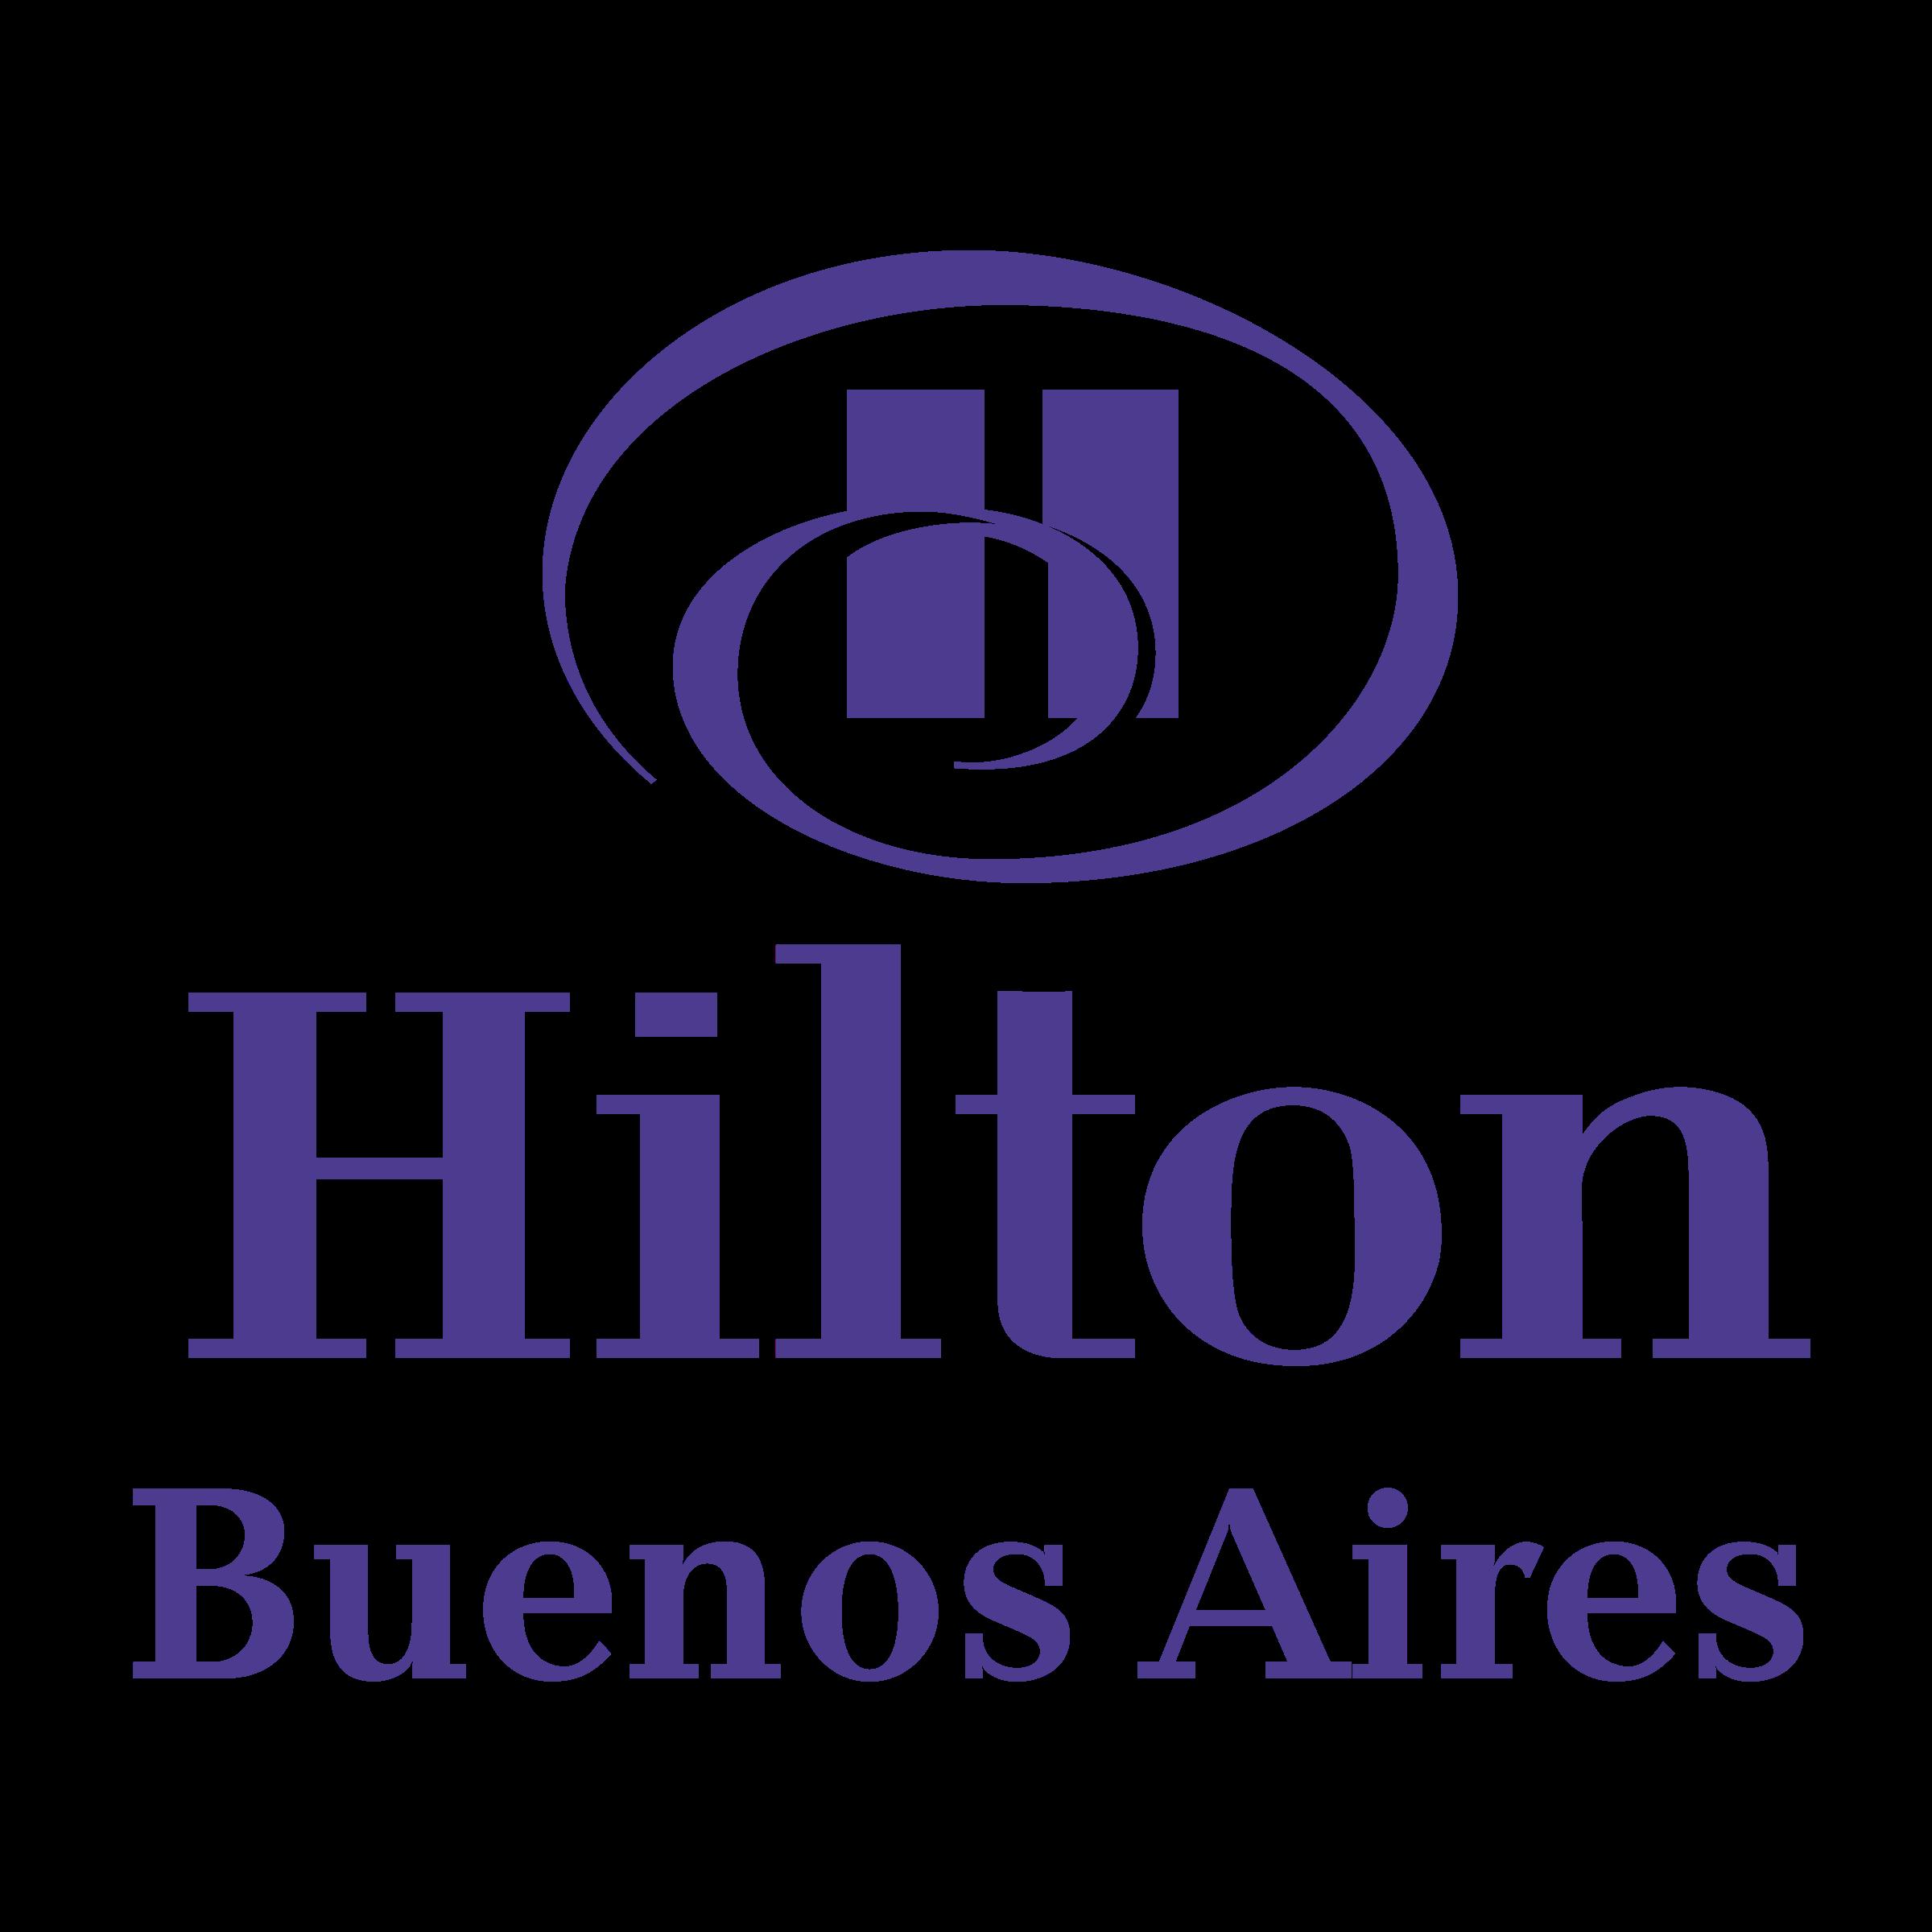 Hilton Buenos Aires Logo PNG Transparent & SVG Vector.